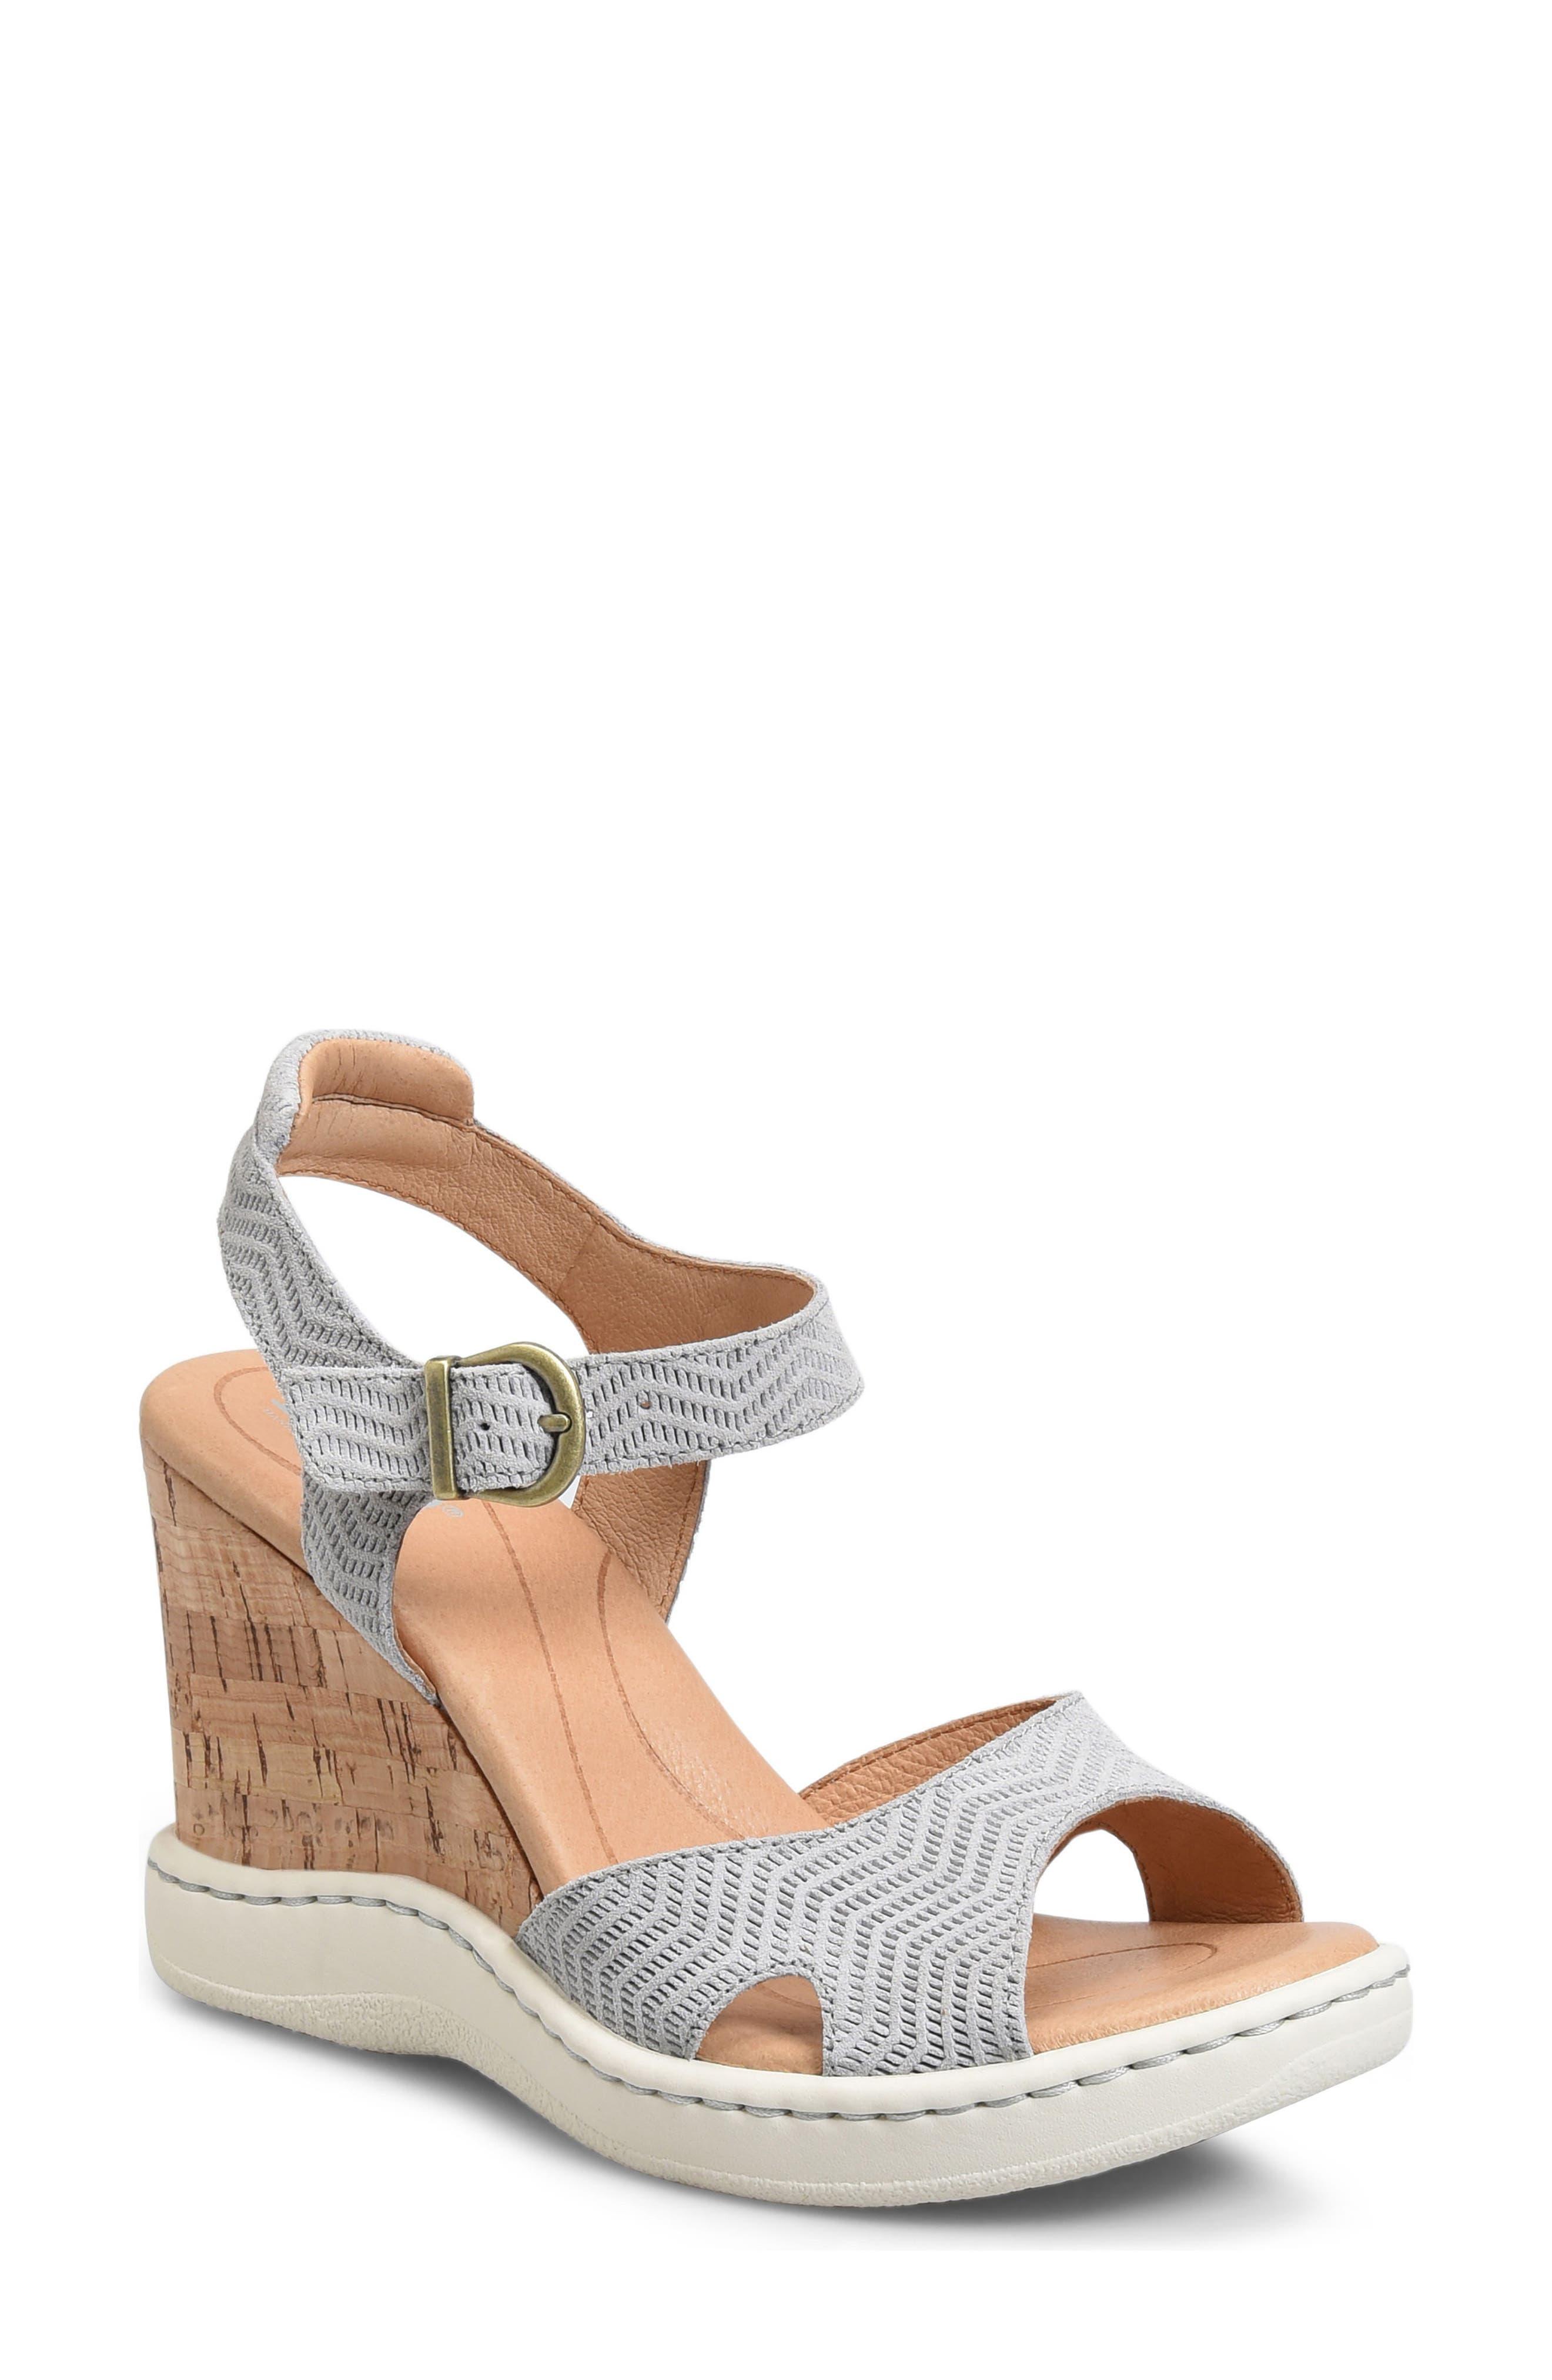 Børn Puno Wedge Sandal (Women)